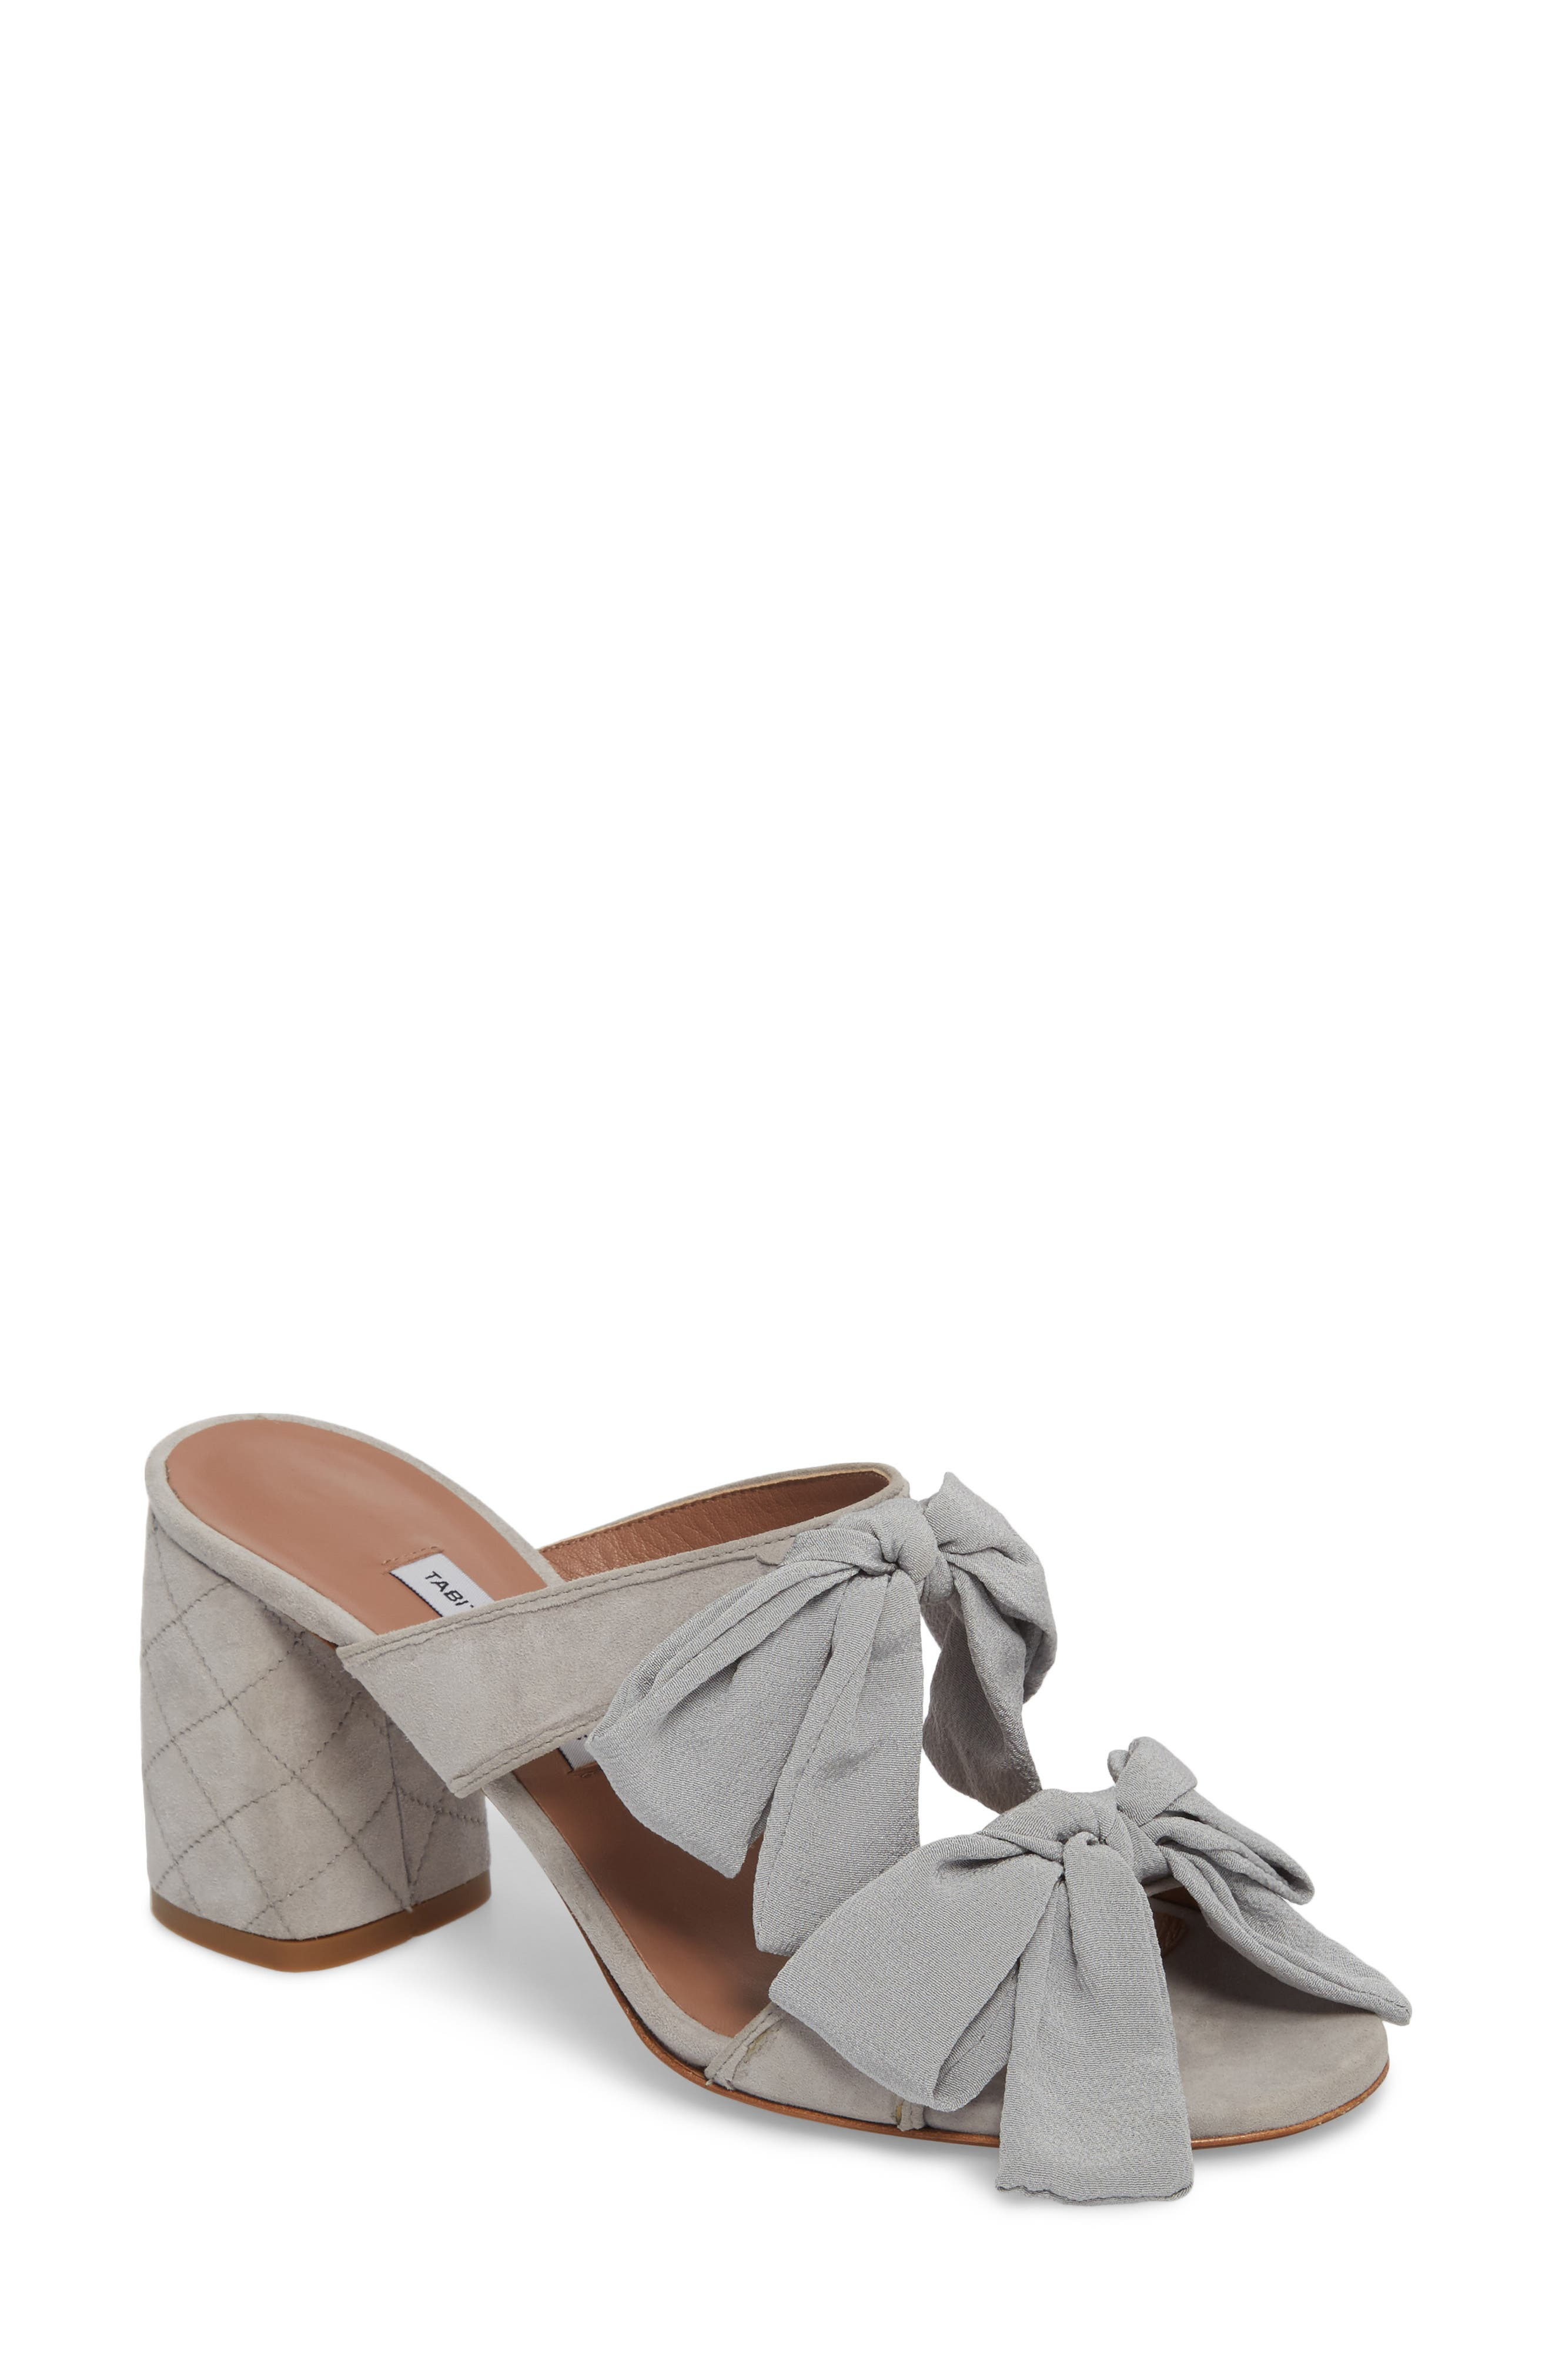 Barbi Bow Sandal,                         Main,                         color,